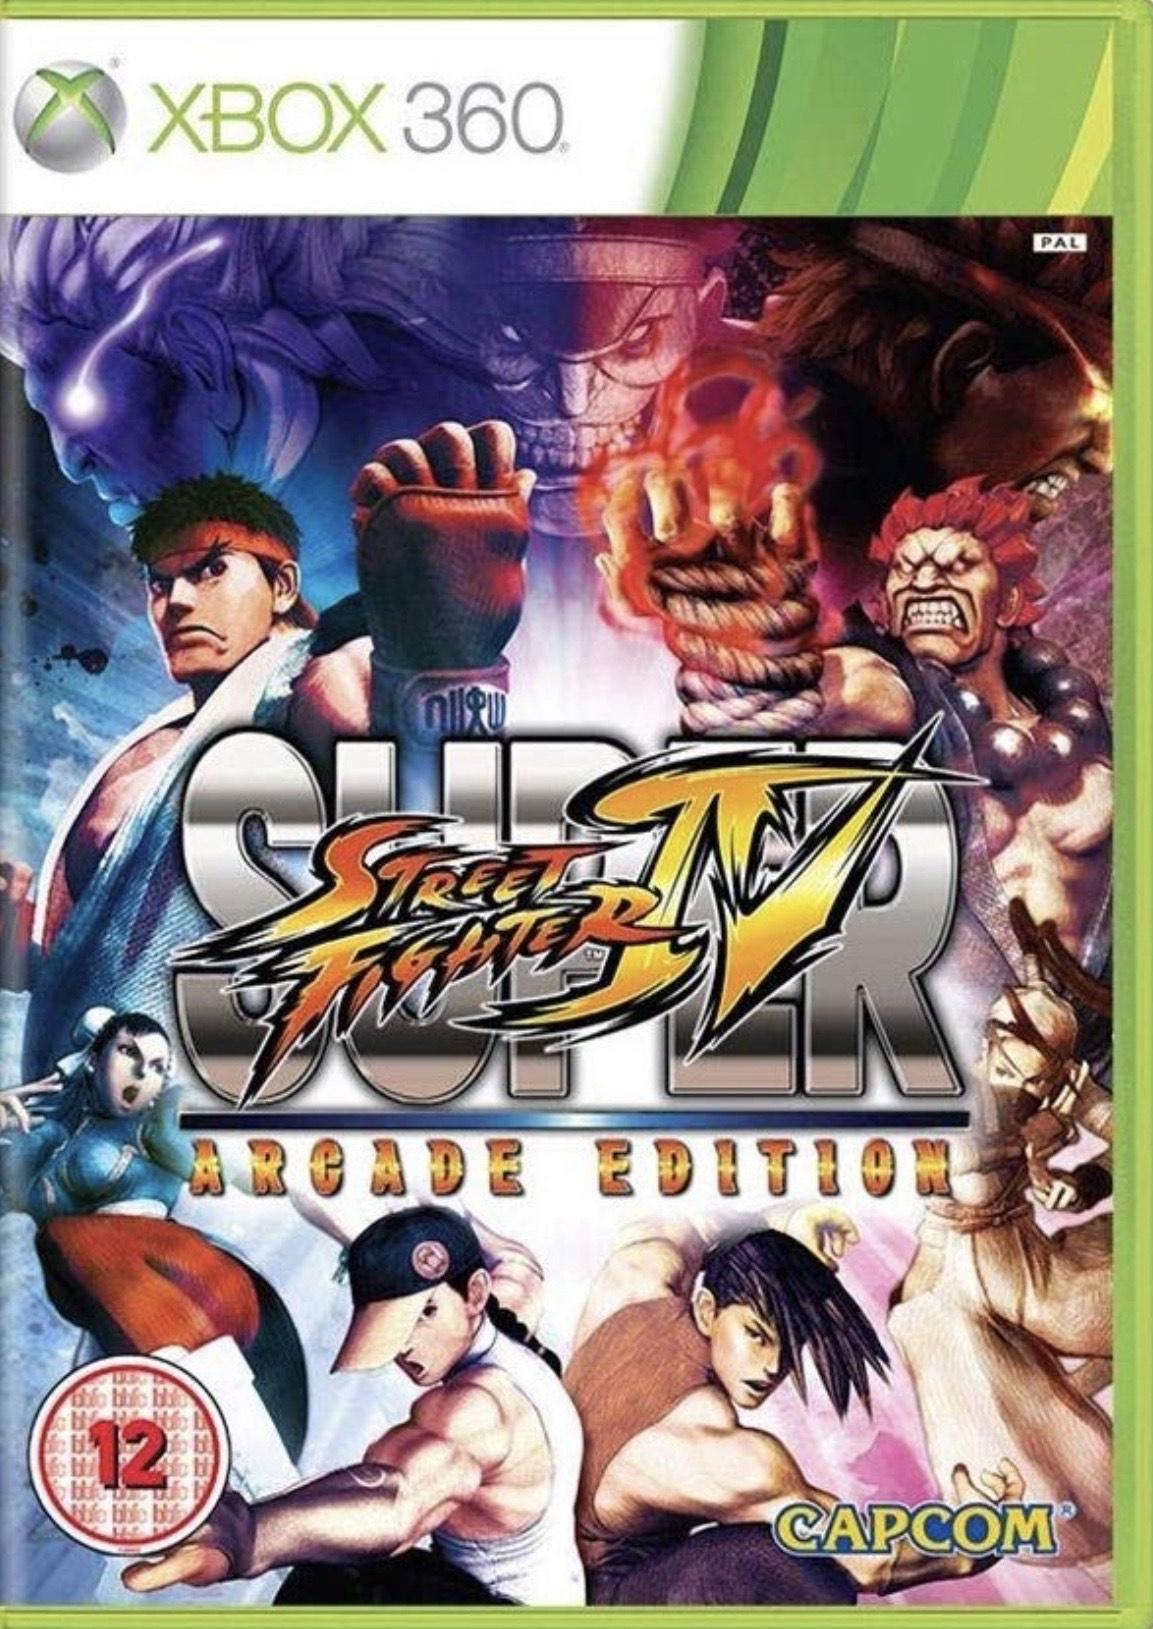 Super Streetfighter IV Arcade Edition - (Xbox 360/Xbox one) - £3.99 @ Microsoft store